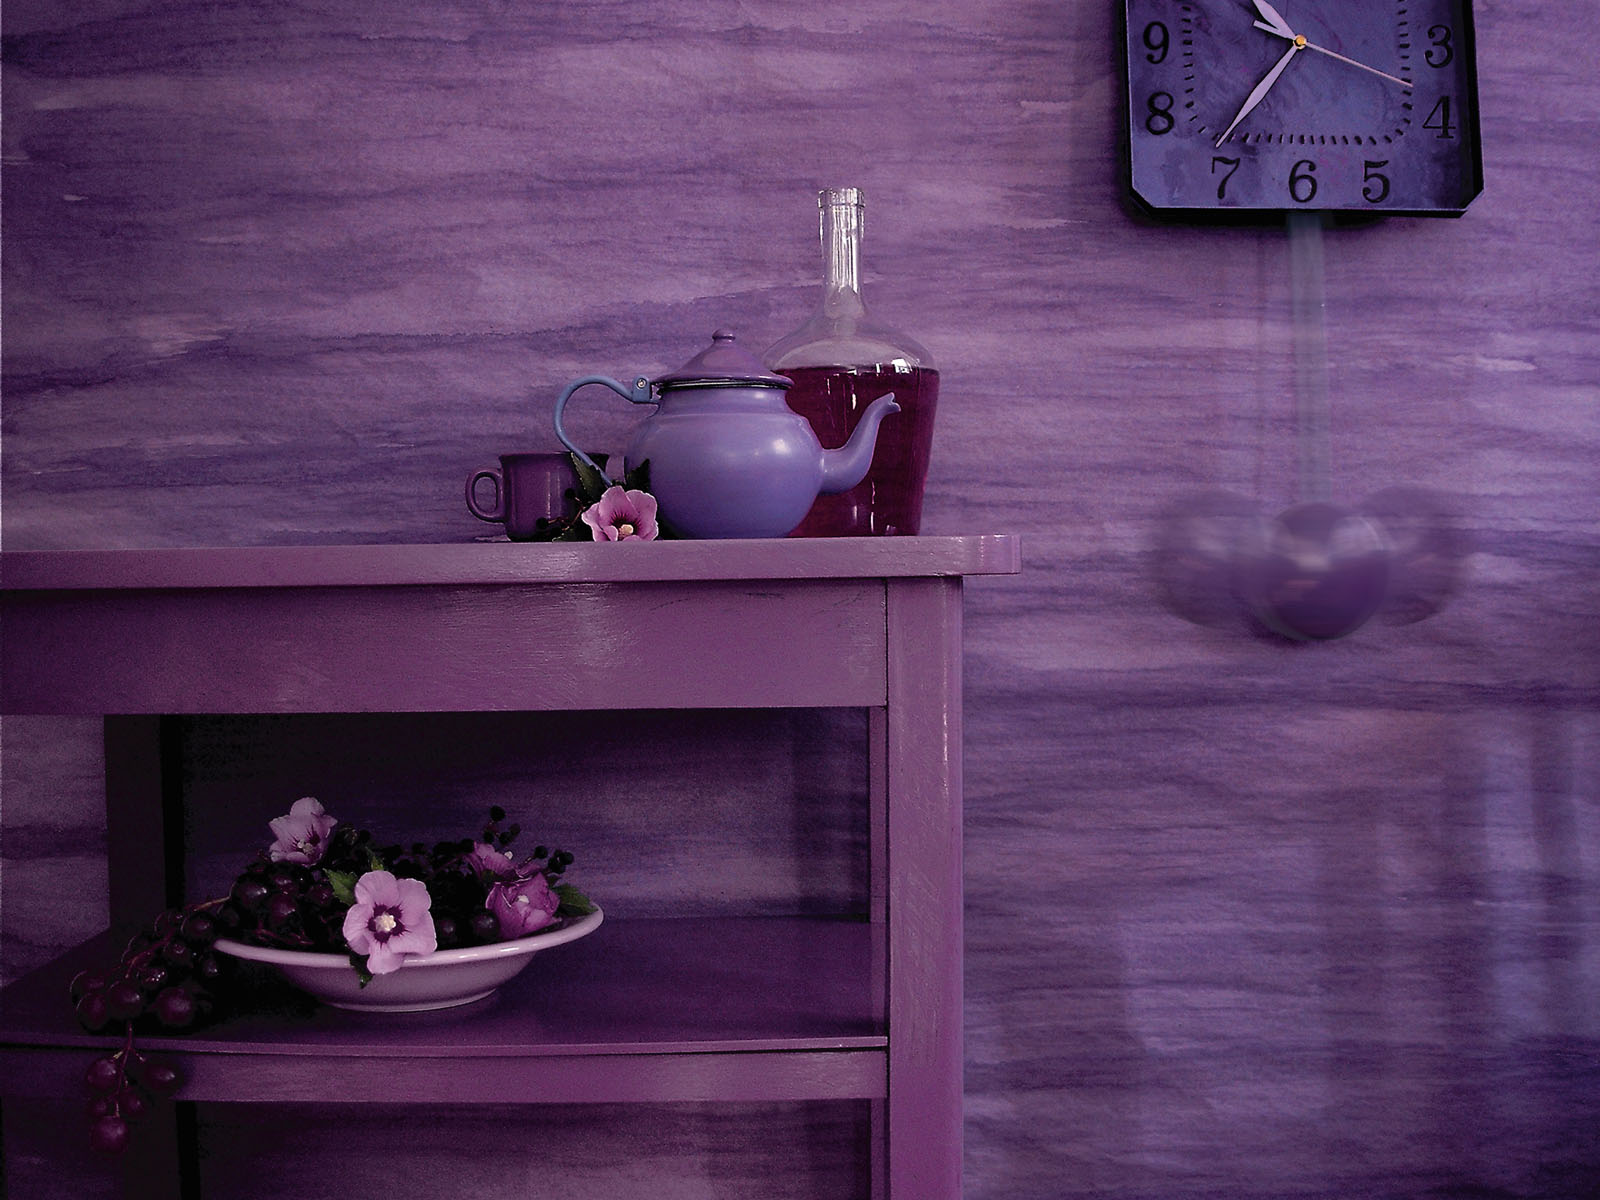 Purple wall wallpapers Purple wall stock photos 1600x1200